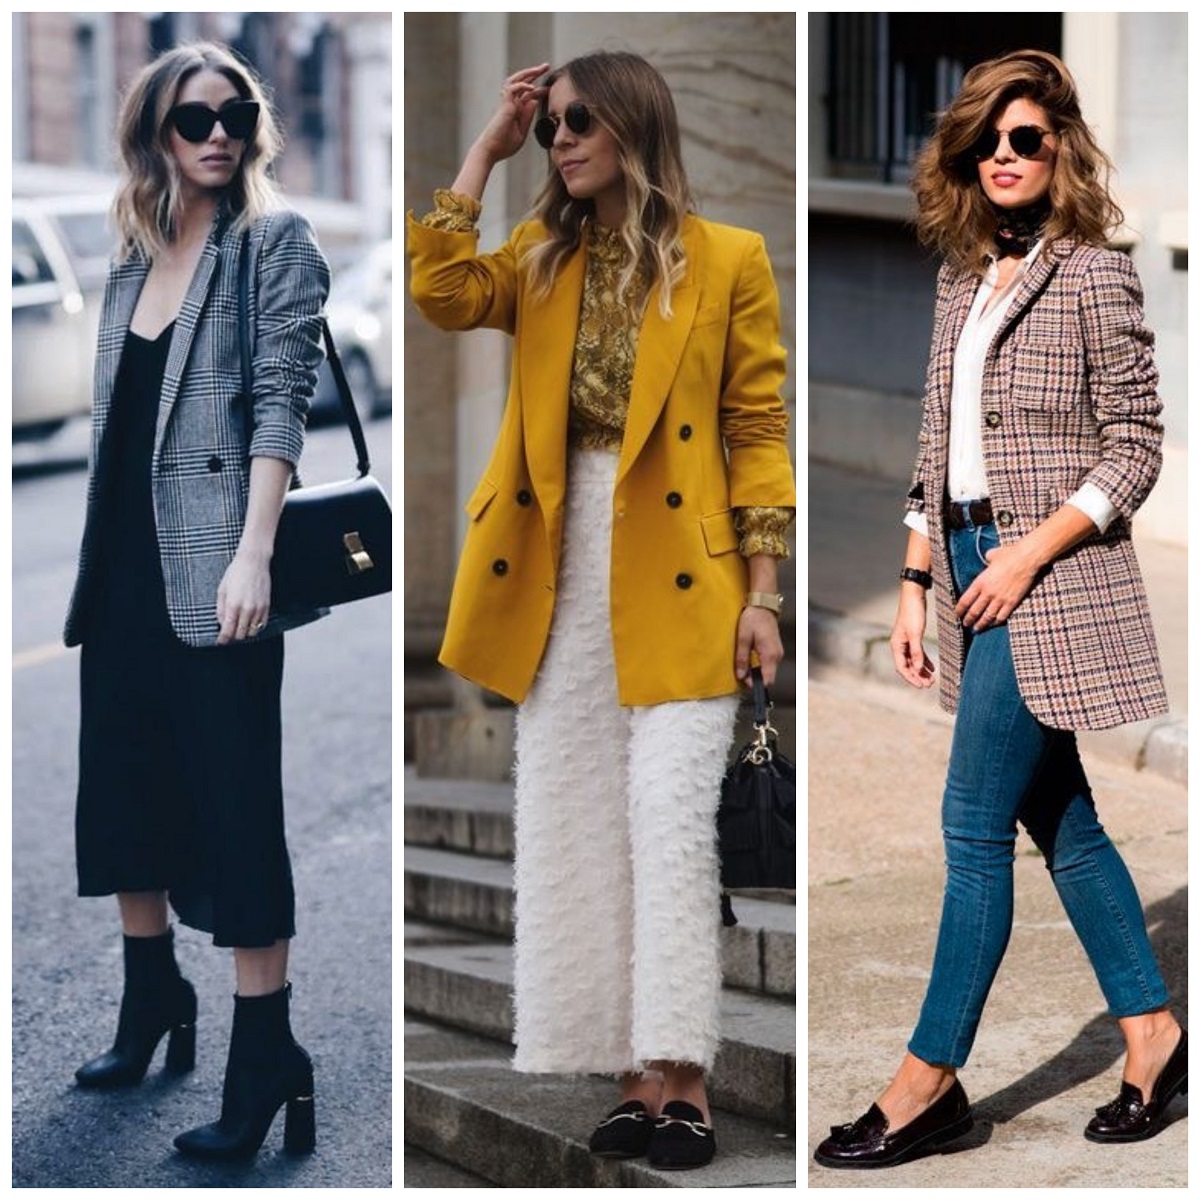 moda - tendencias inverno foto de dentro 4